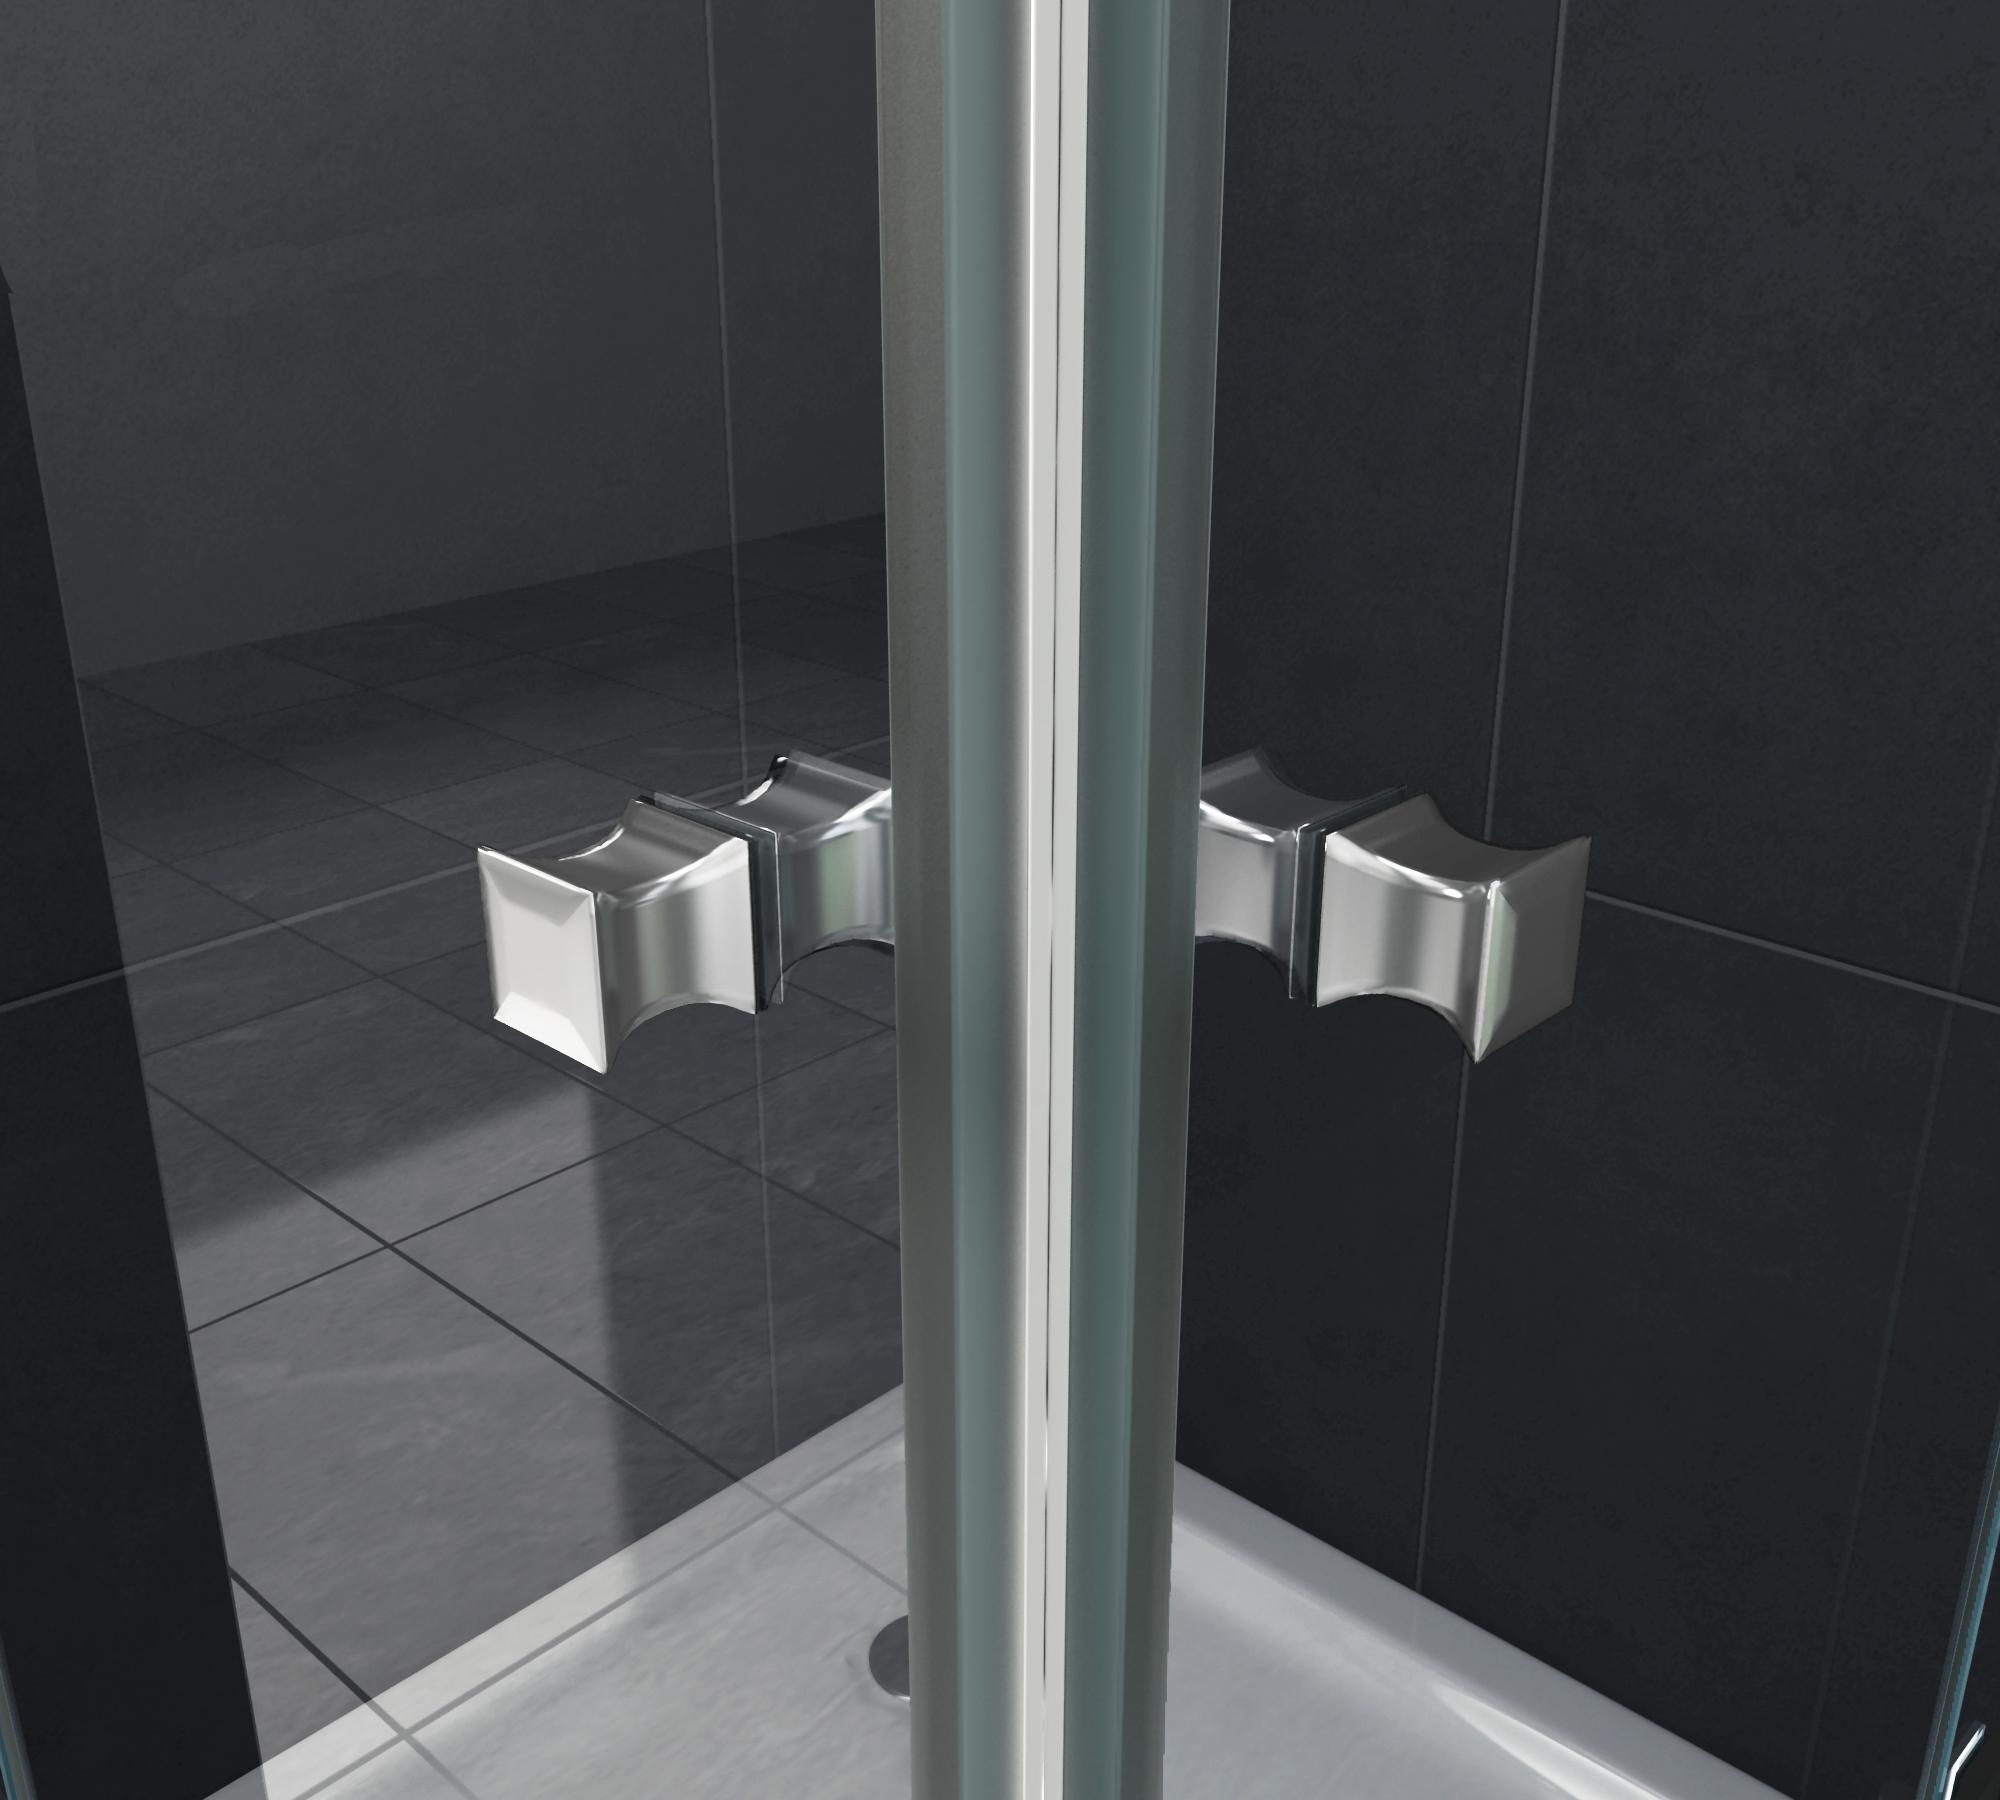 rahmenlose duschkabine luxorline 120 x 100 x 195 cm ohne. Black Bedroom Furniture Sets. Home Design Ideas